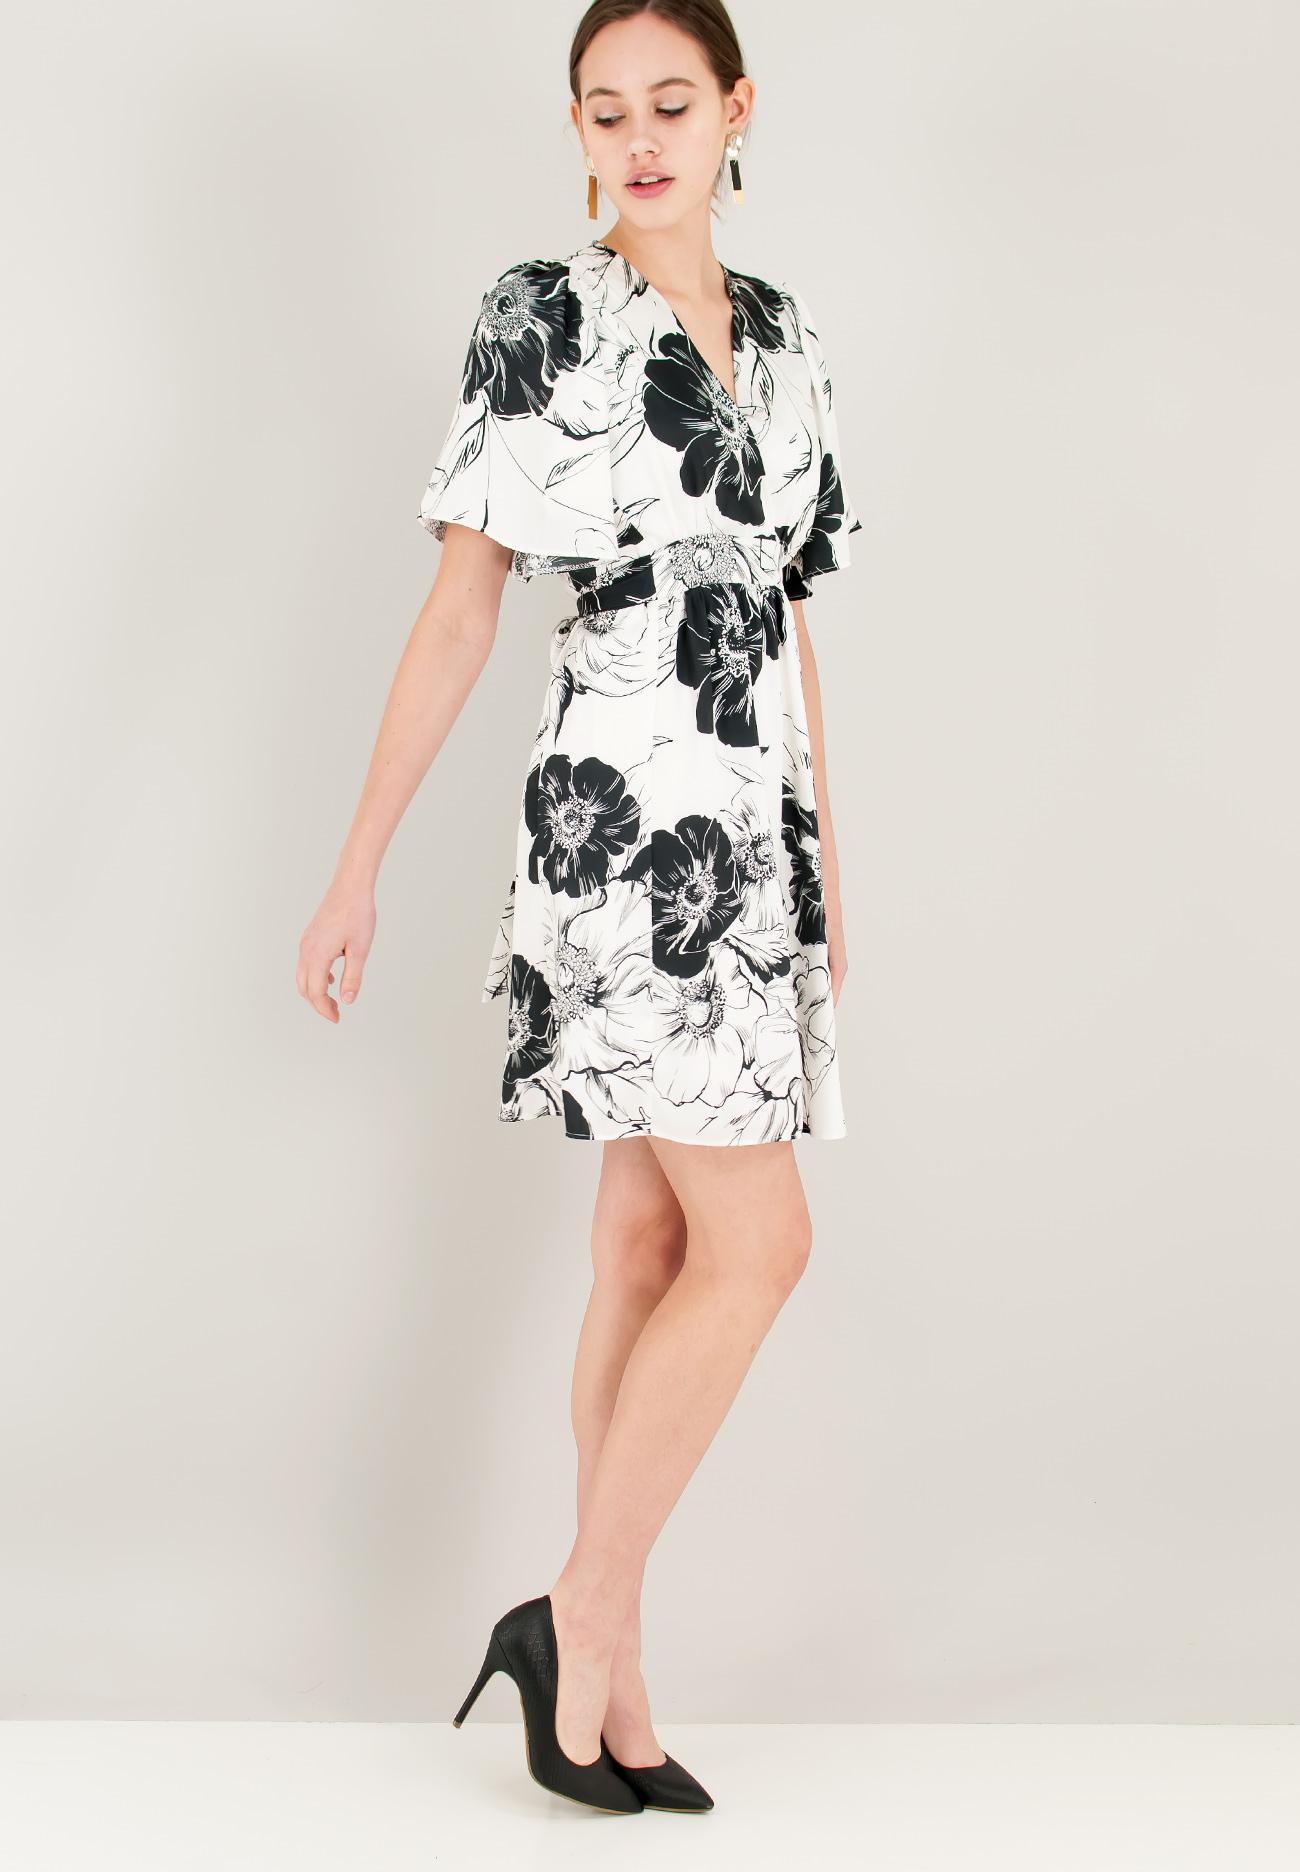 48a019e48198 Μίνι σατέν φόρεμα με φαρδύ μανίκι - ZIC ZAC